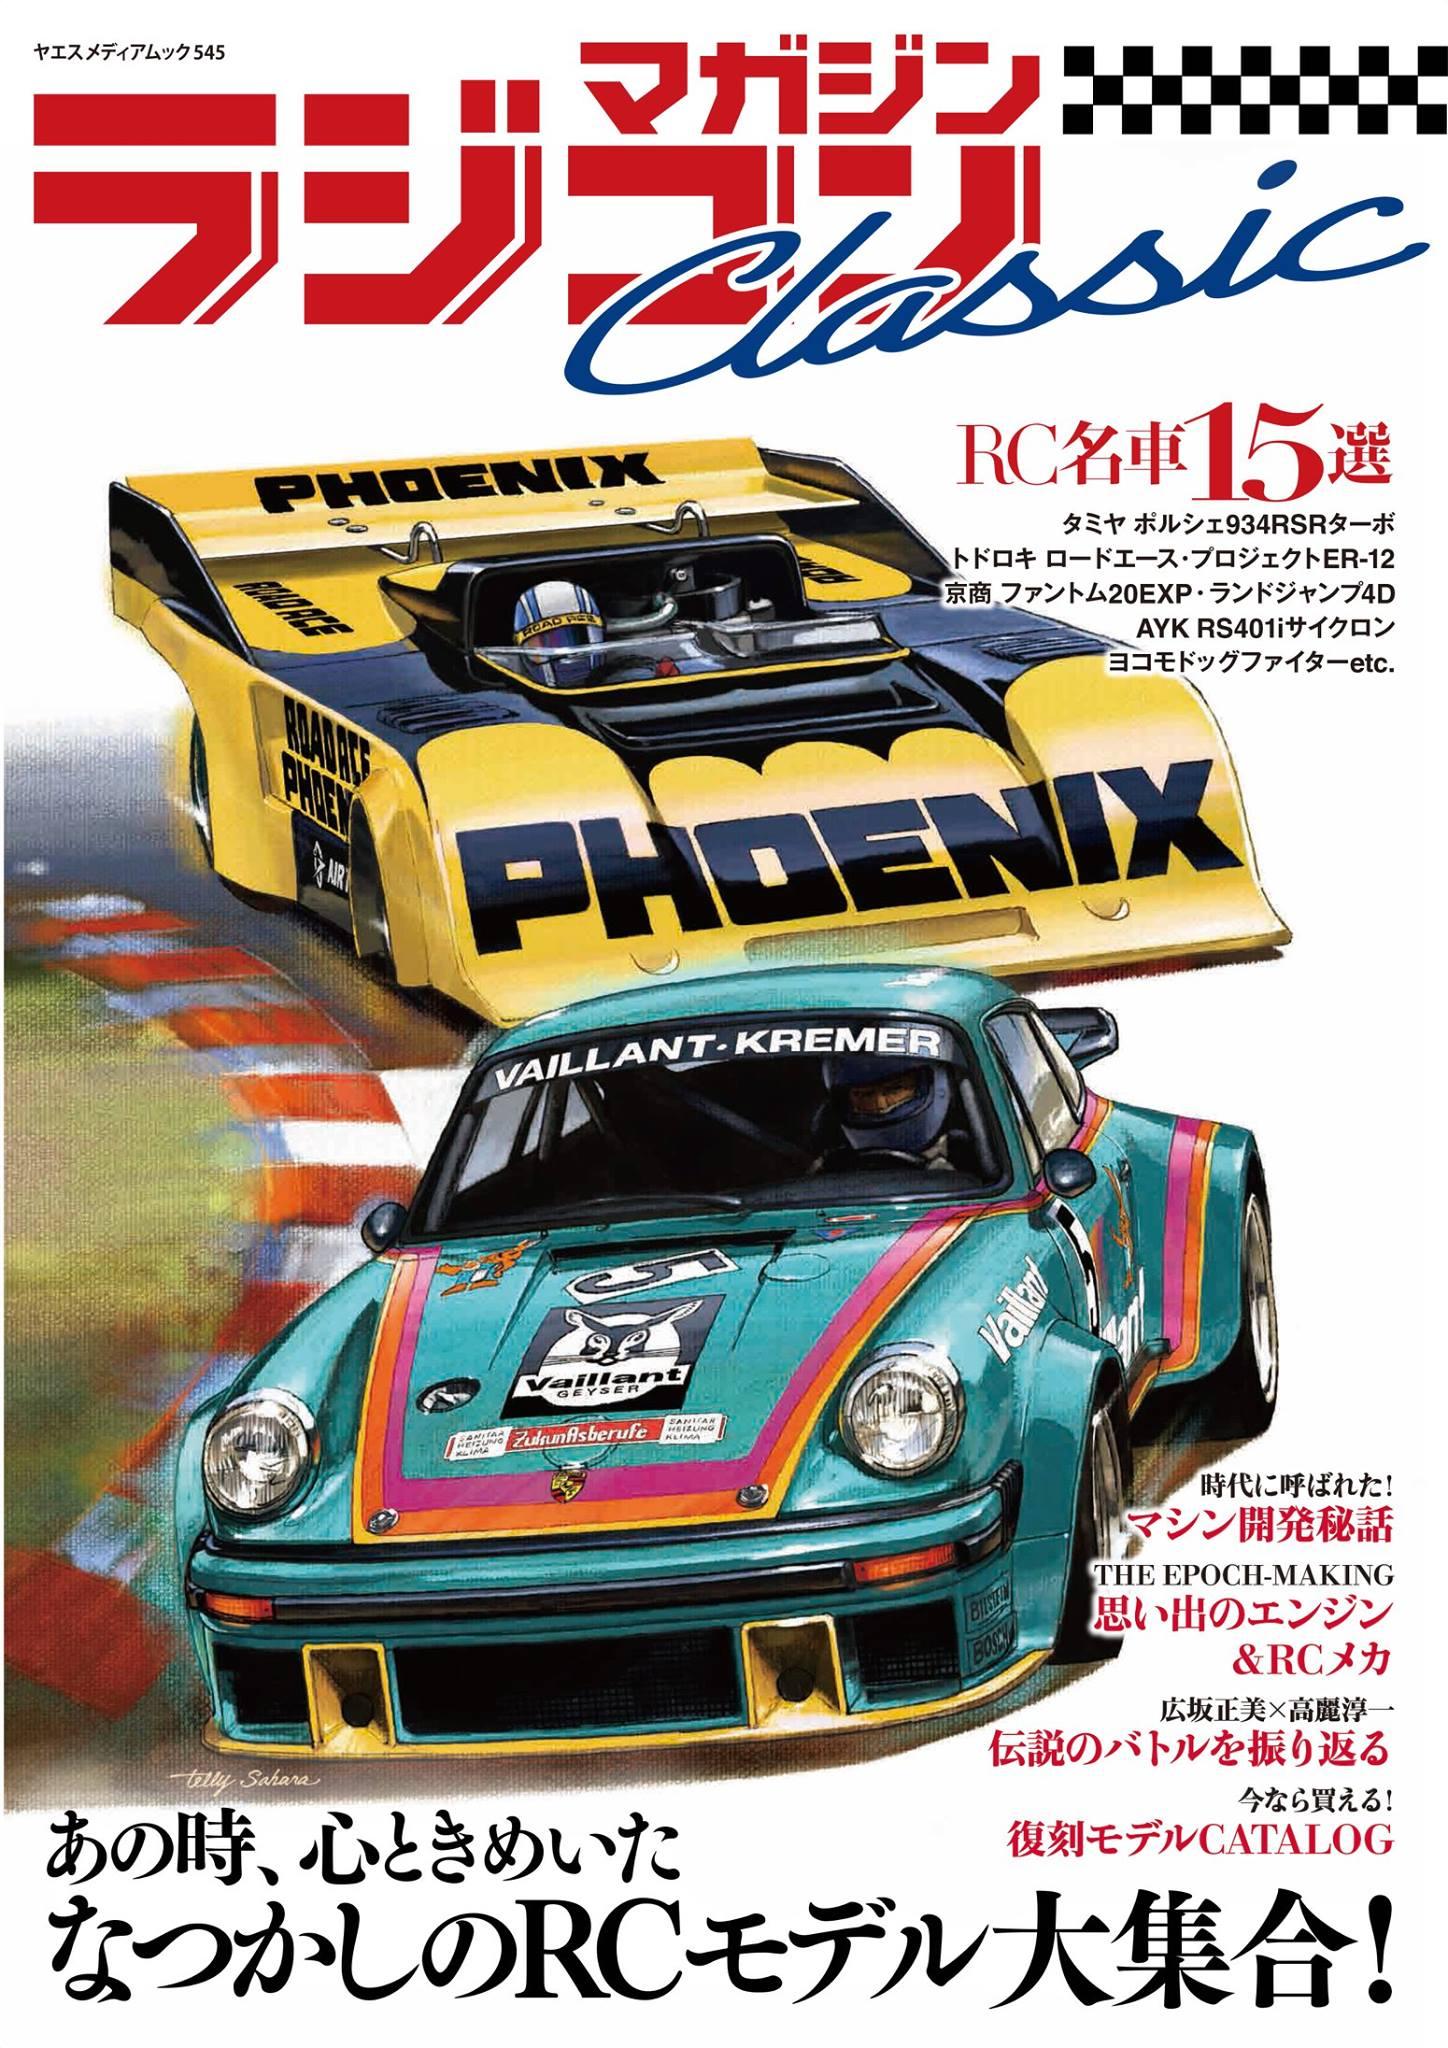 Japanese RC Magazine issue featuring classic Tamiya RC ...